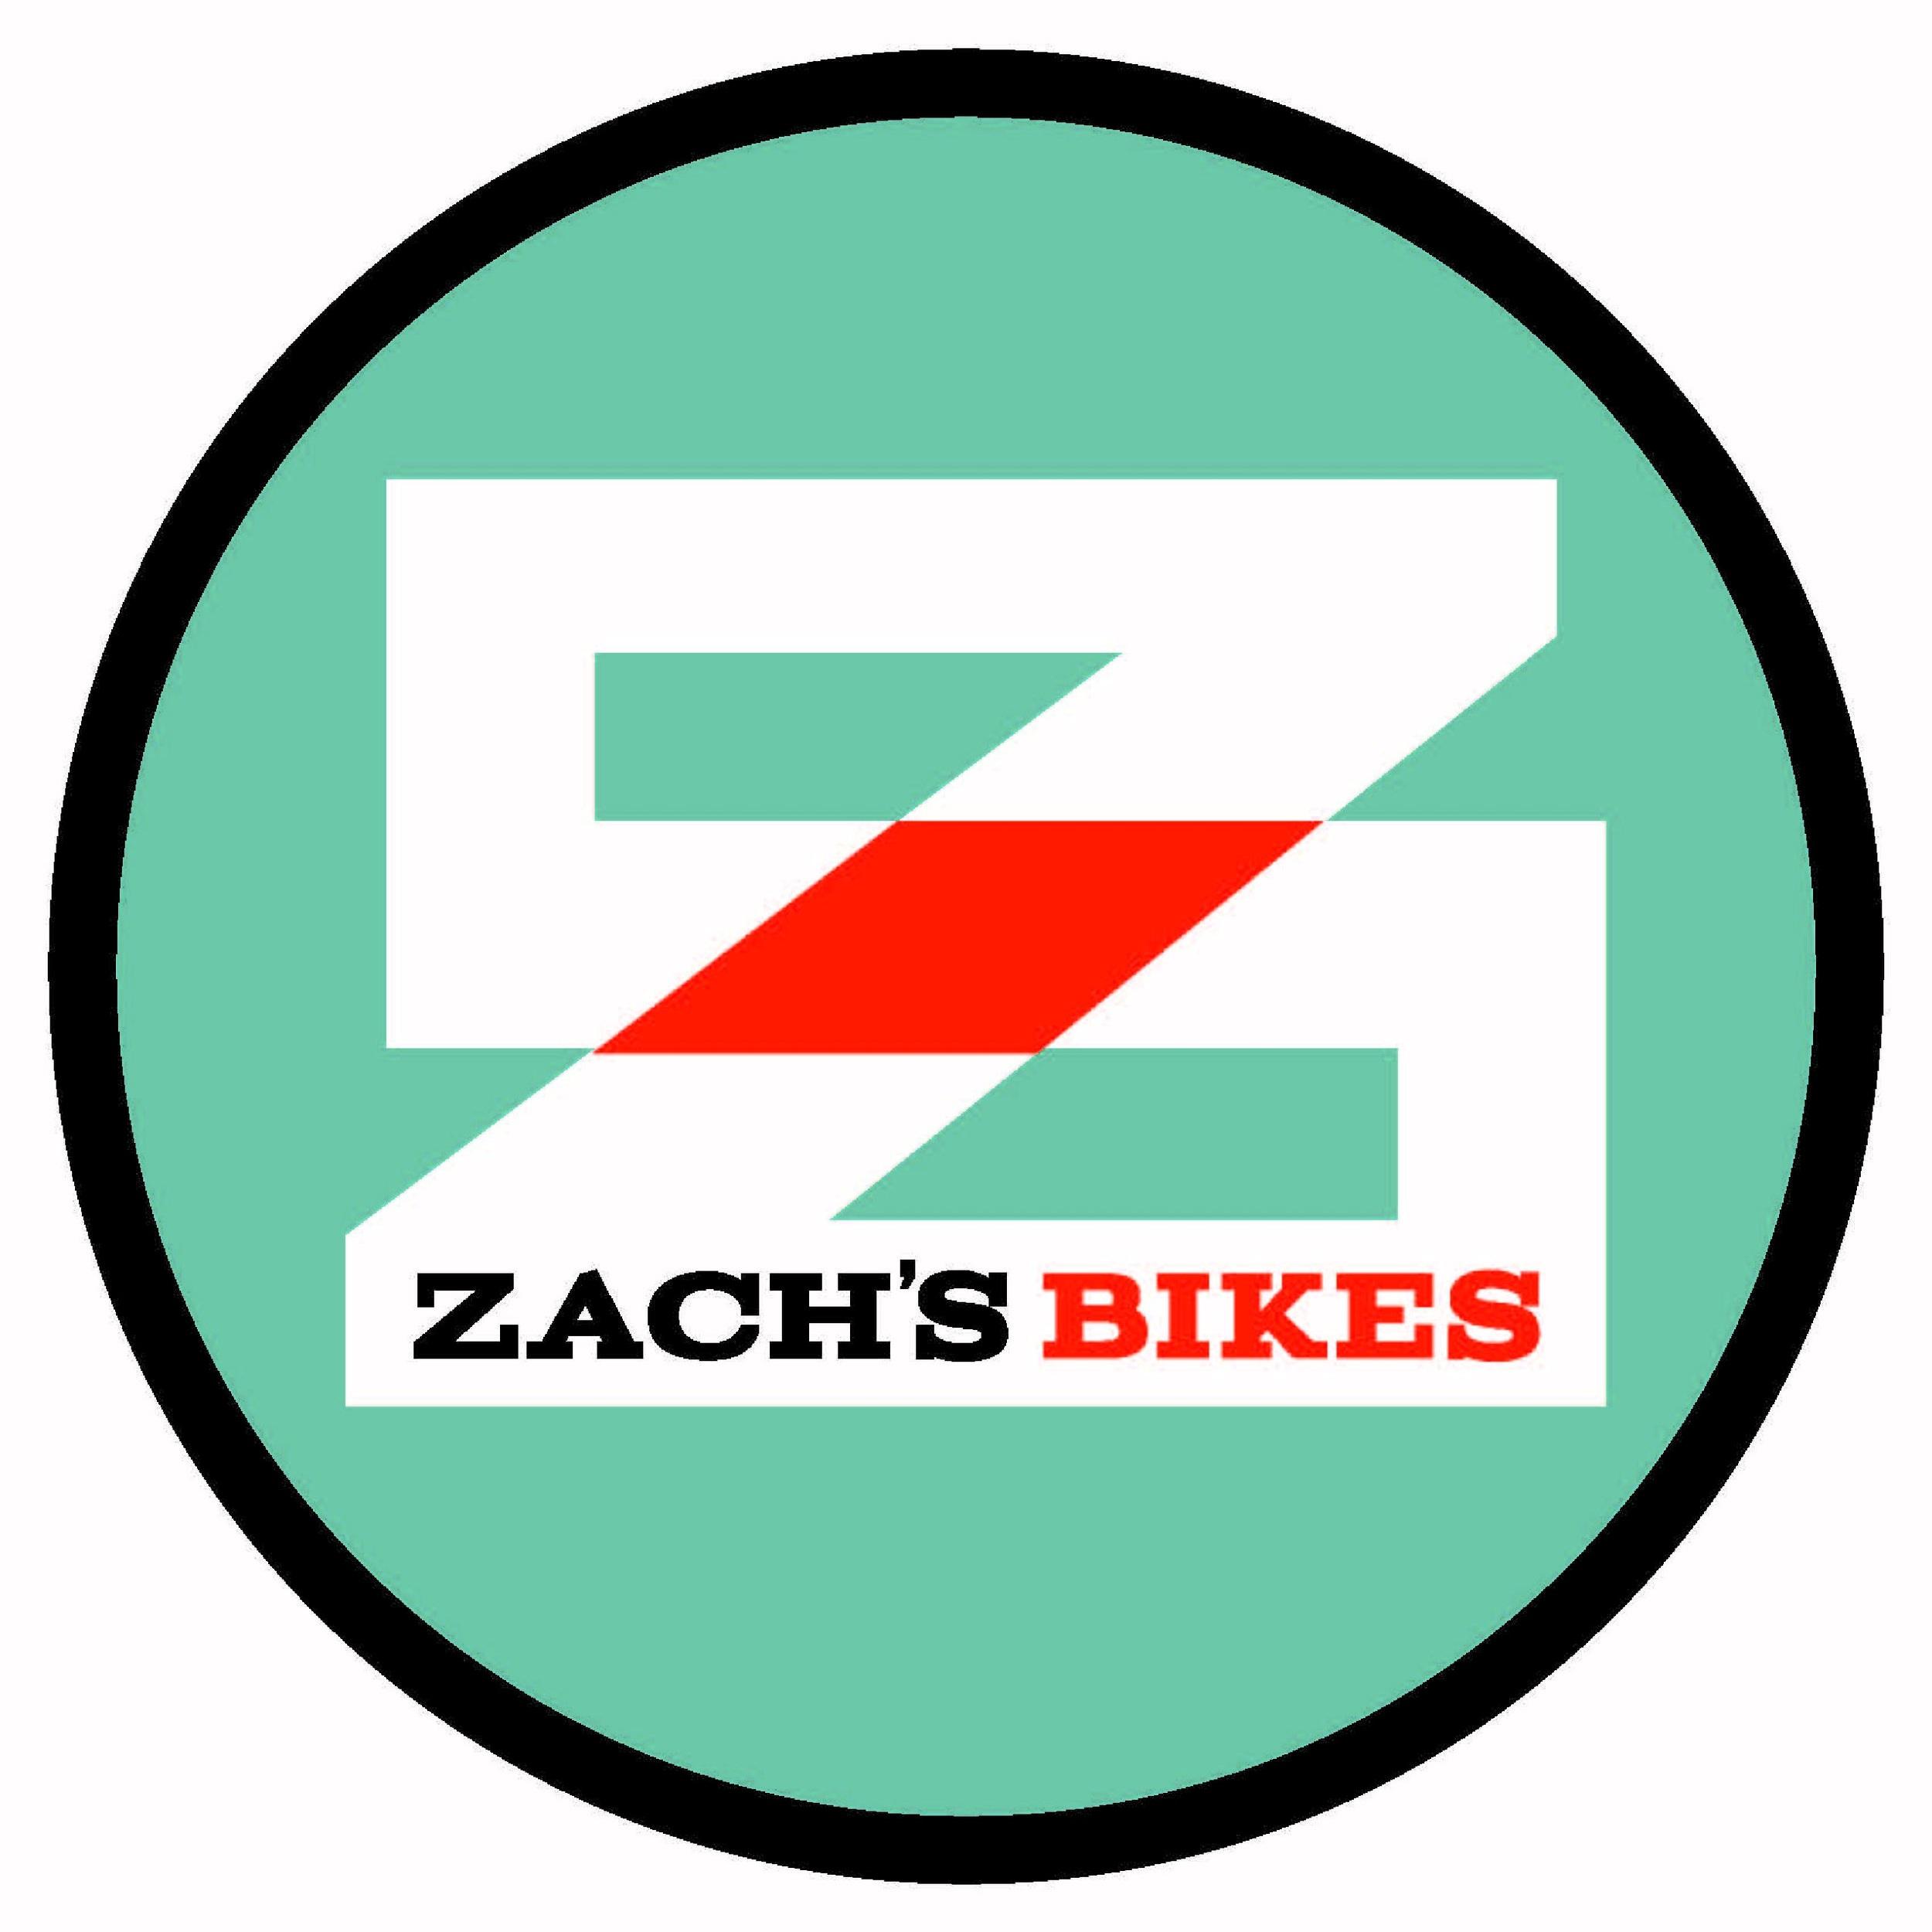 Zachs+Bikes+Logo_Final+square.jpg